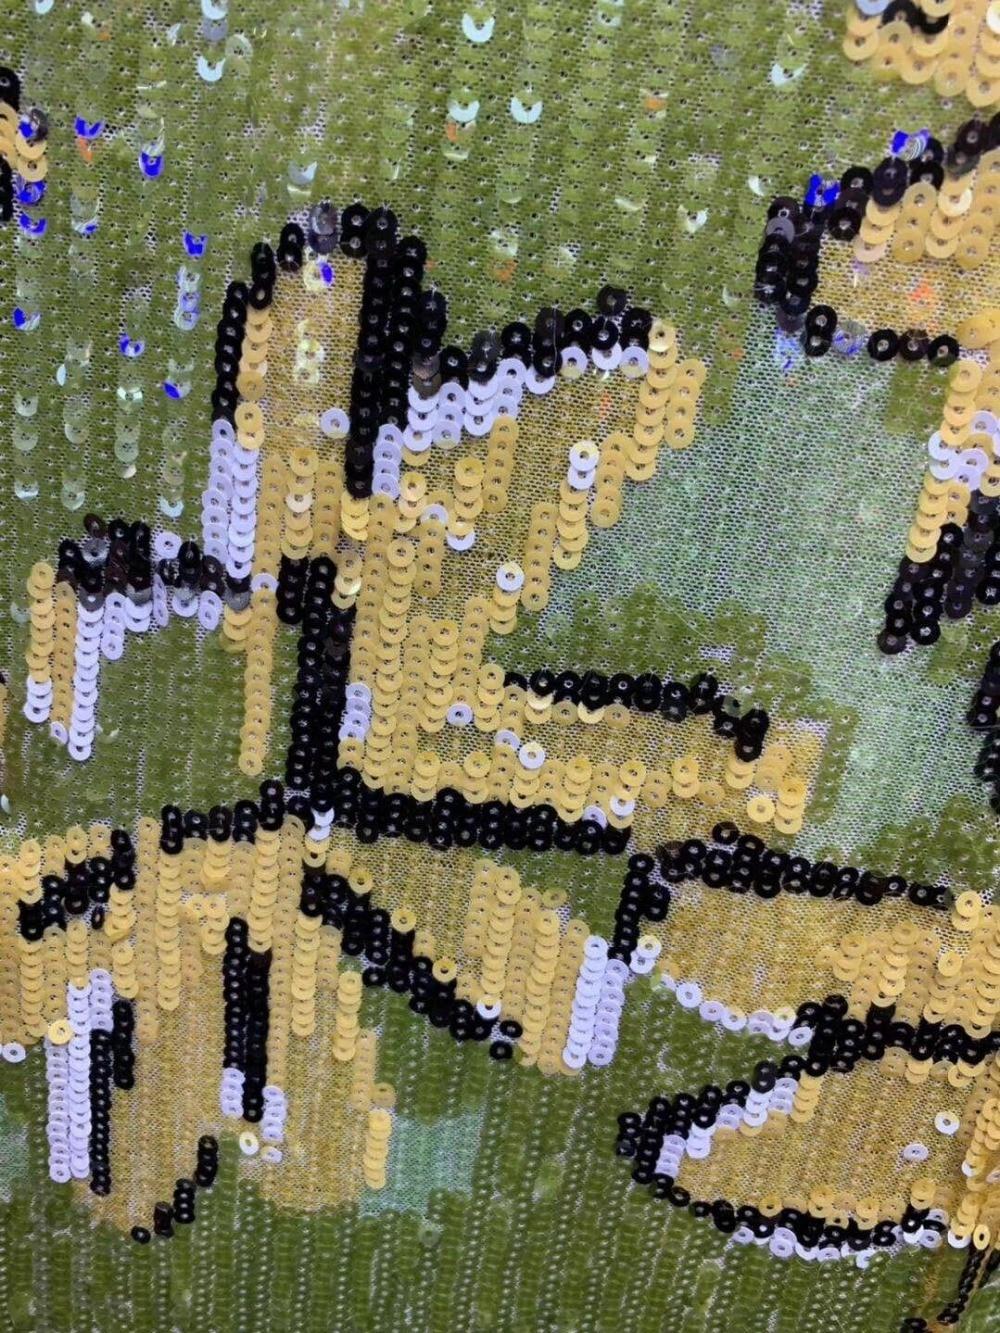 JIANXI.C 5608 brodé dentelle africaine tissu paillettes dentelle 5 yards dentelle française pour robe de soirée-in Dentelle from Maison & Animalerie    2